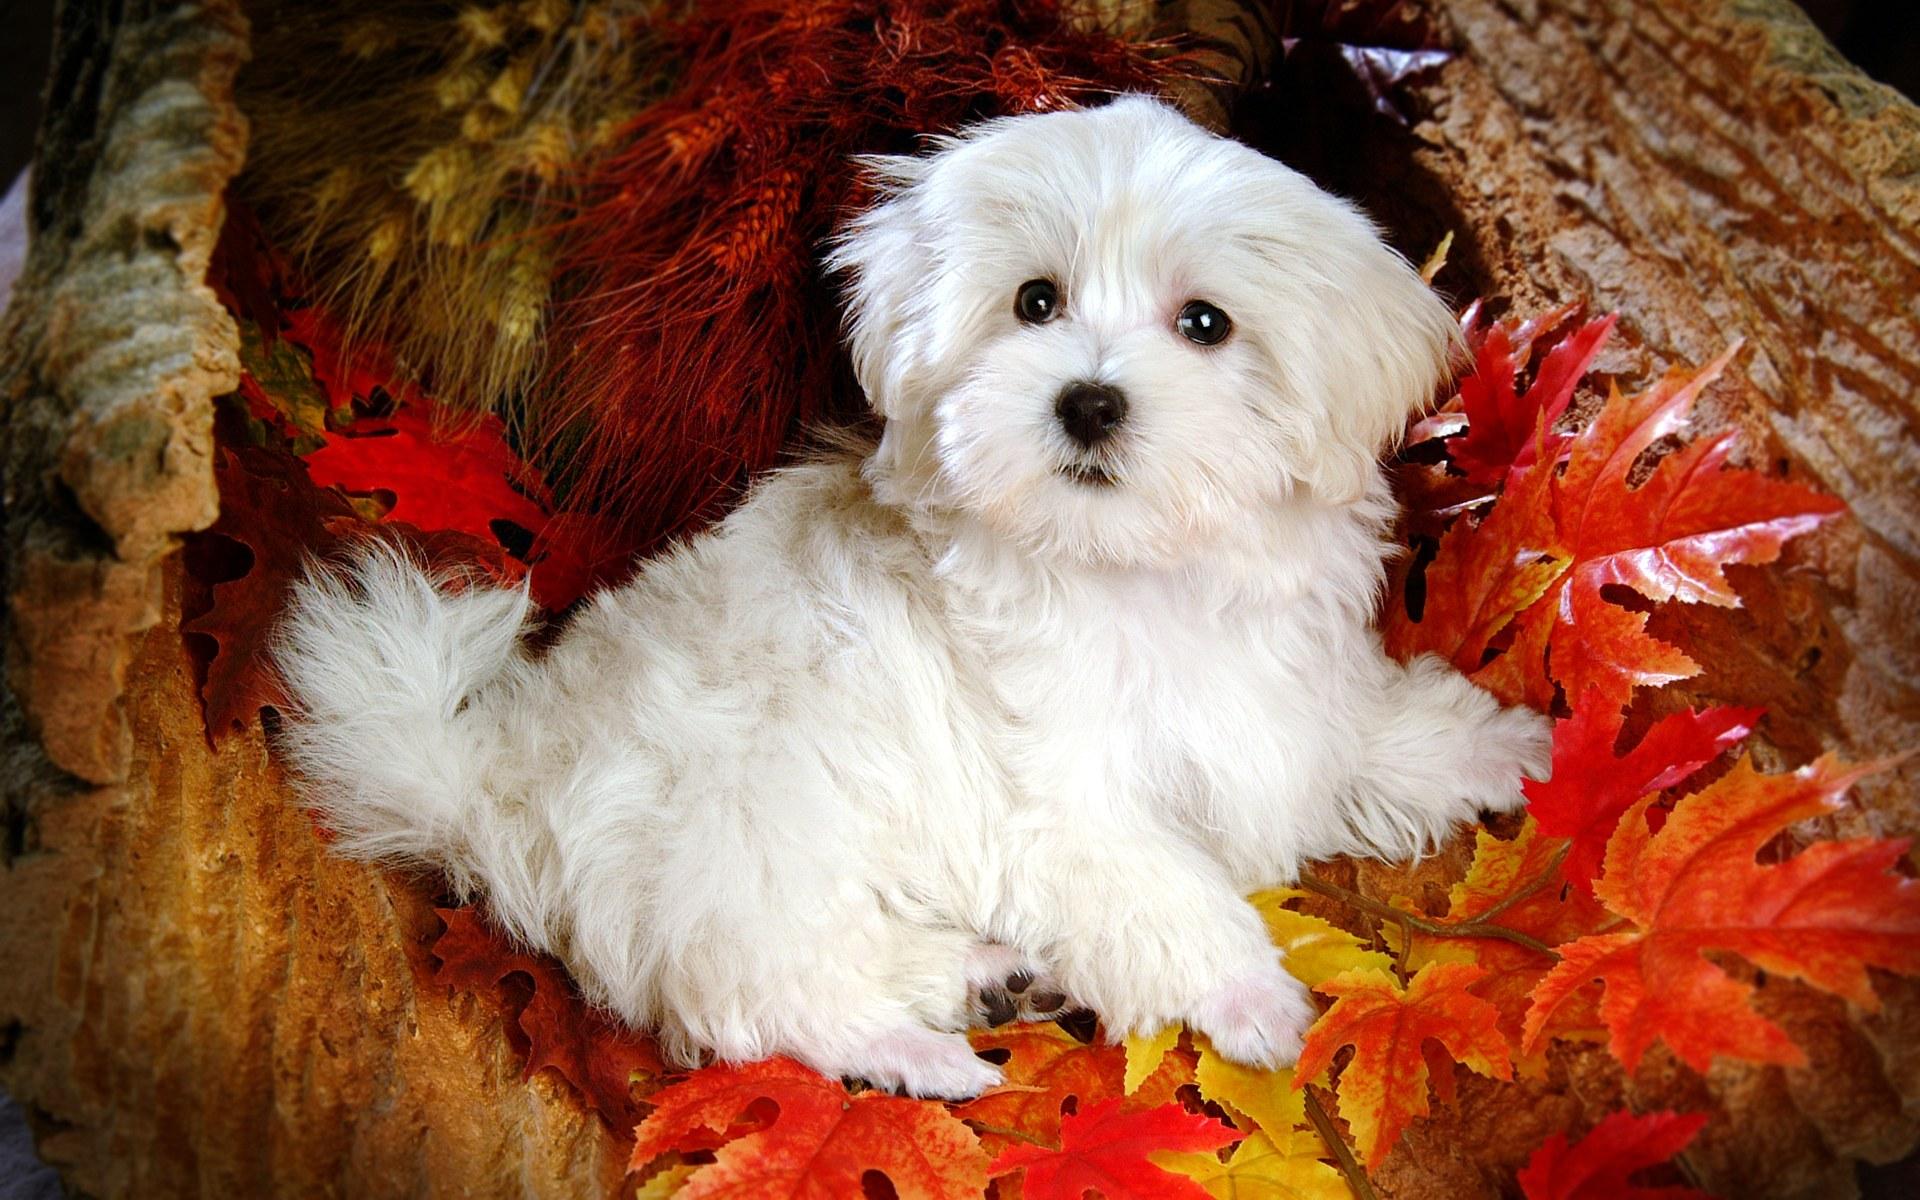 Pitbull Puppies Puppy Wallpaper Download 1920x1200